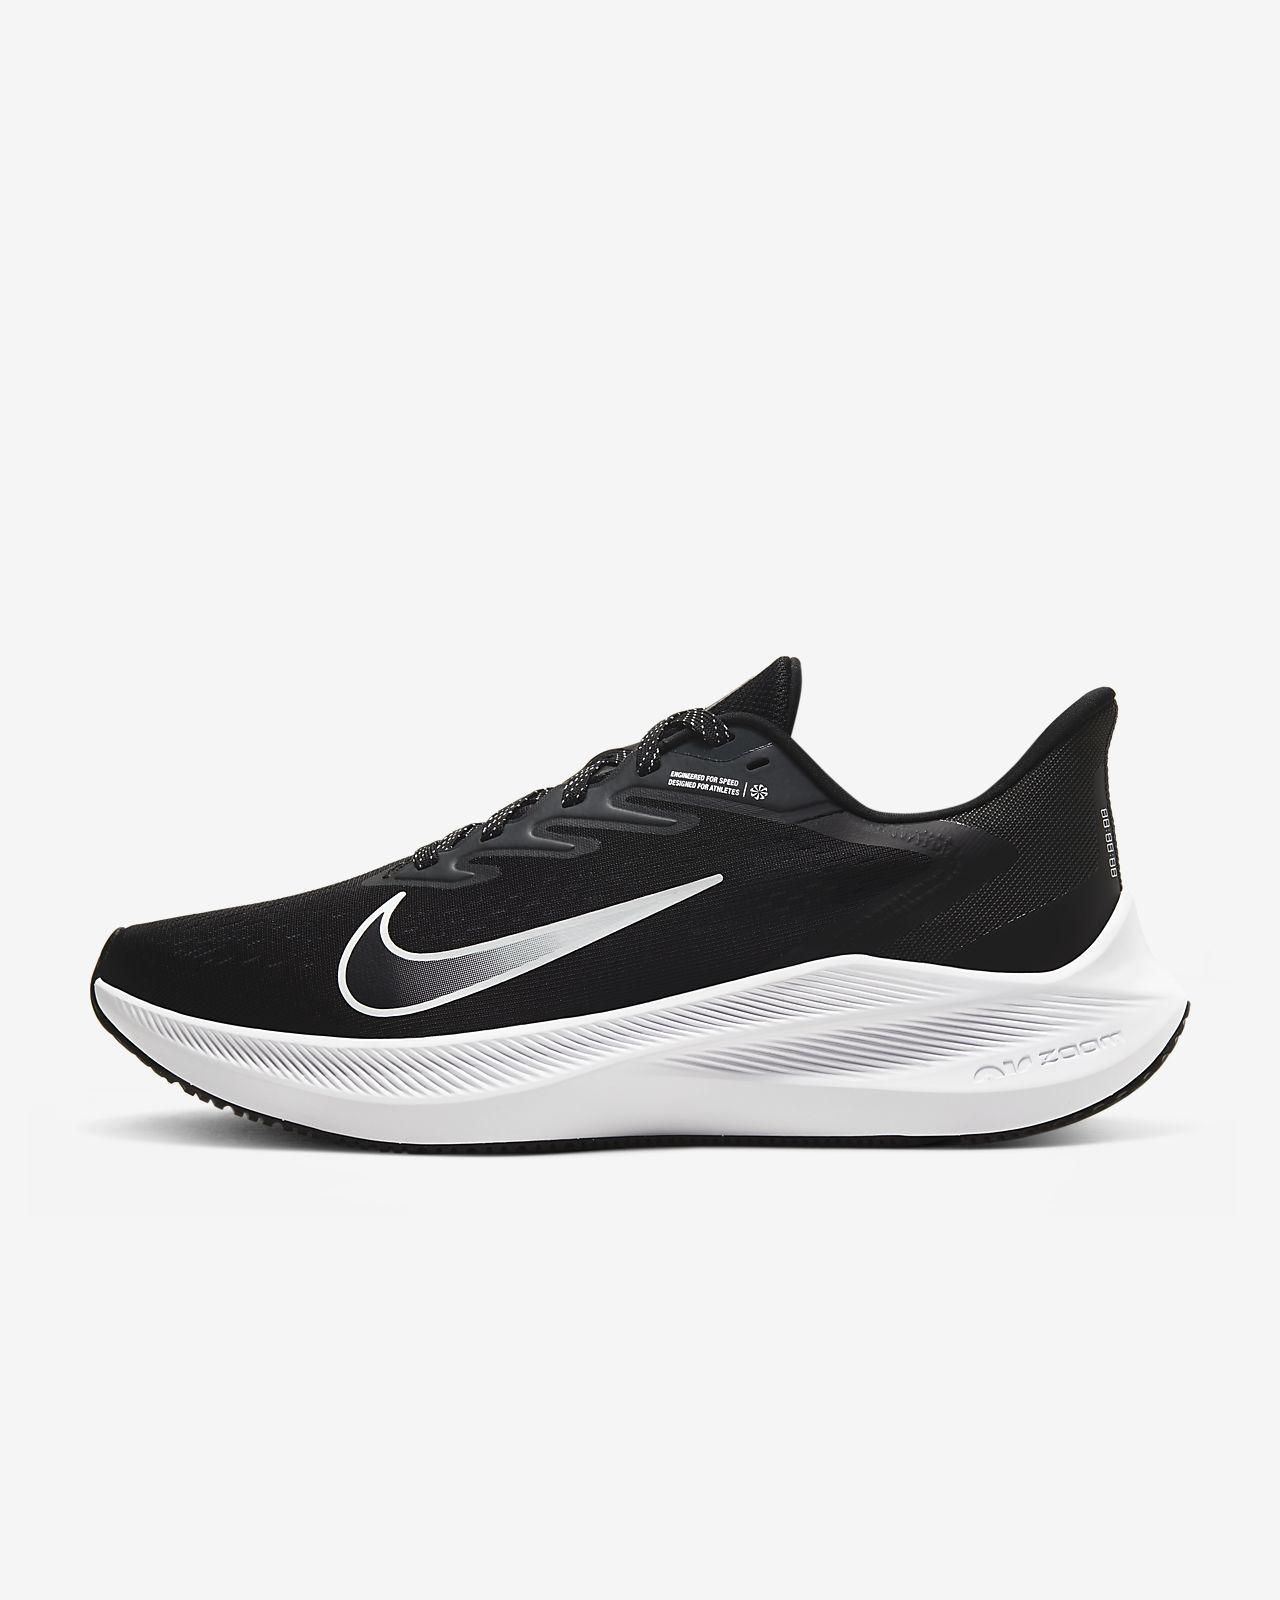 Nike Zoom Winflo 7 女子跑步鞋